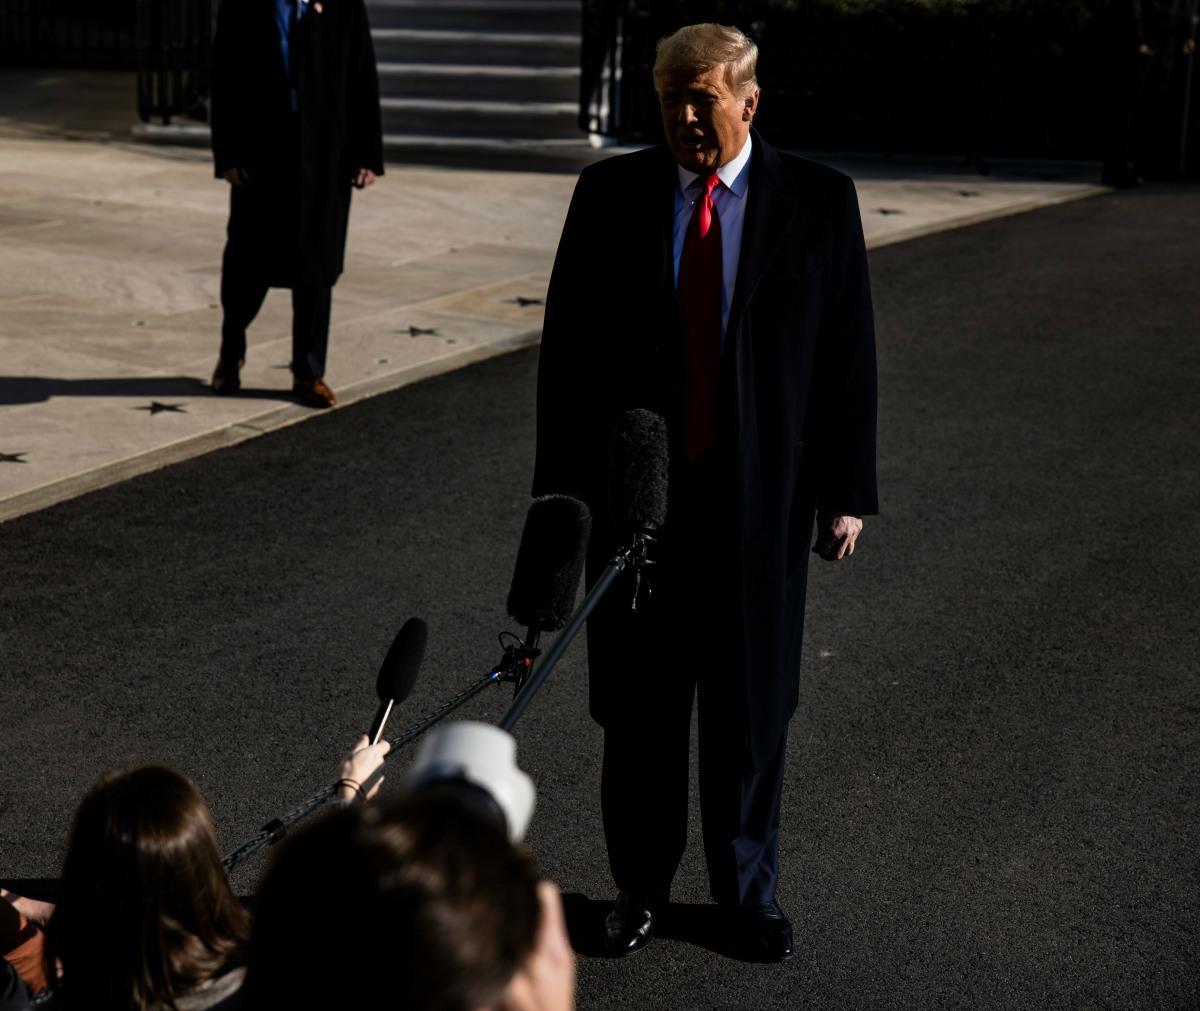 Trump Departure for Alamo, Texas